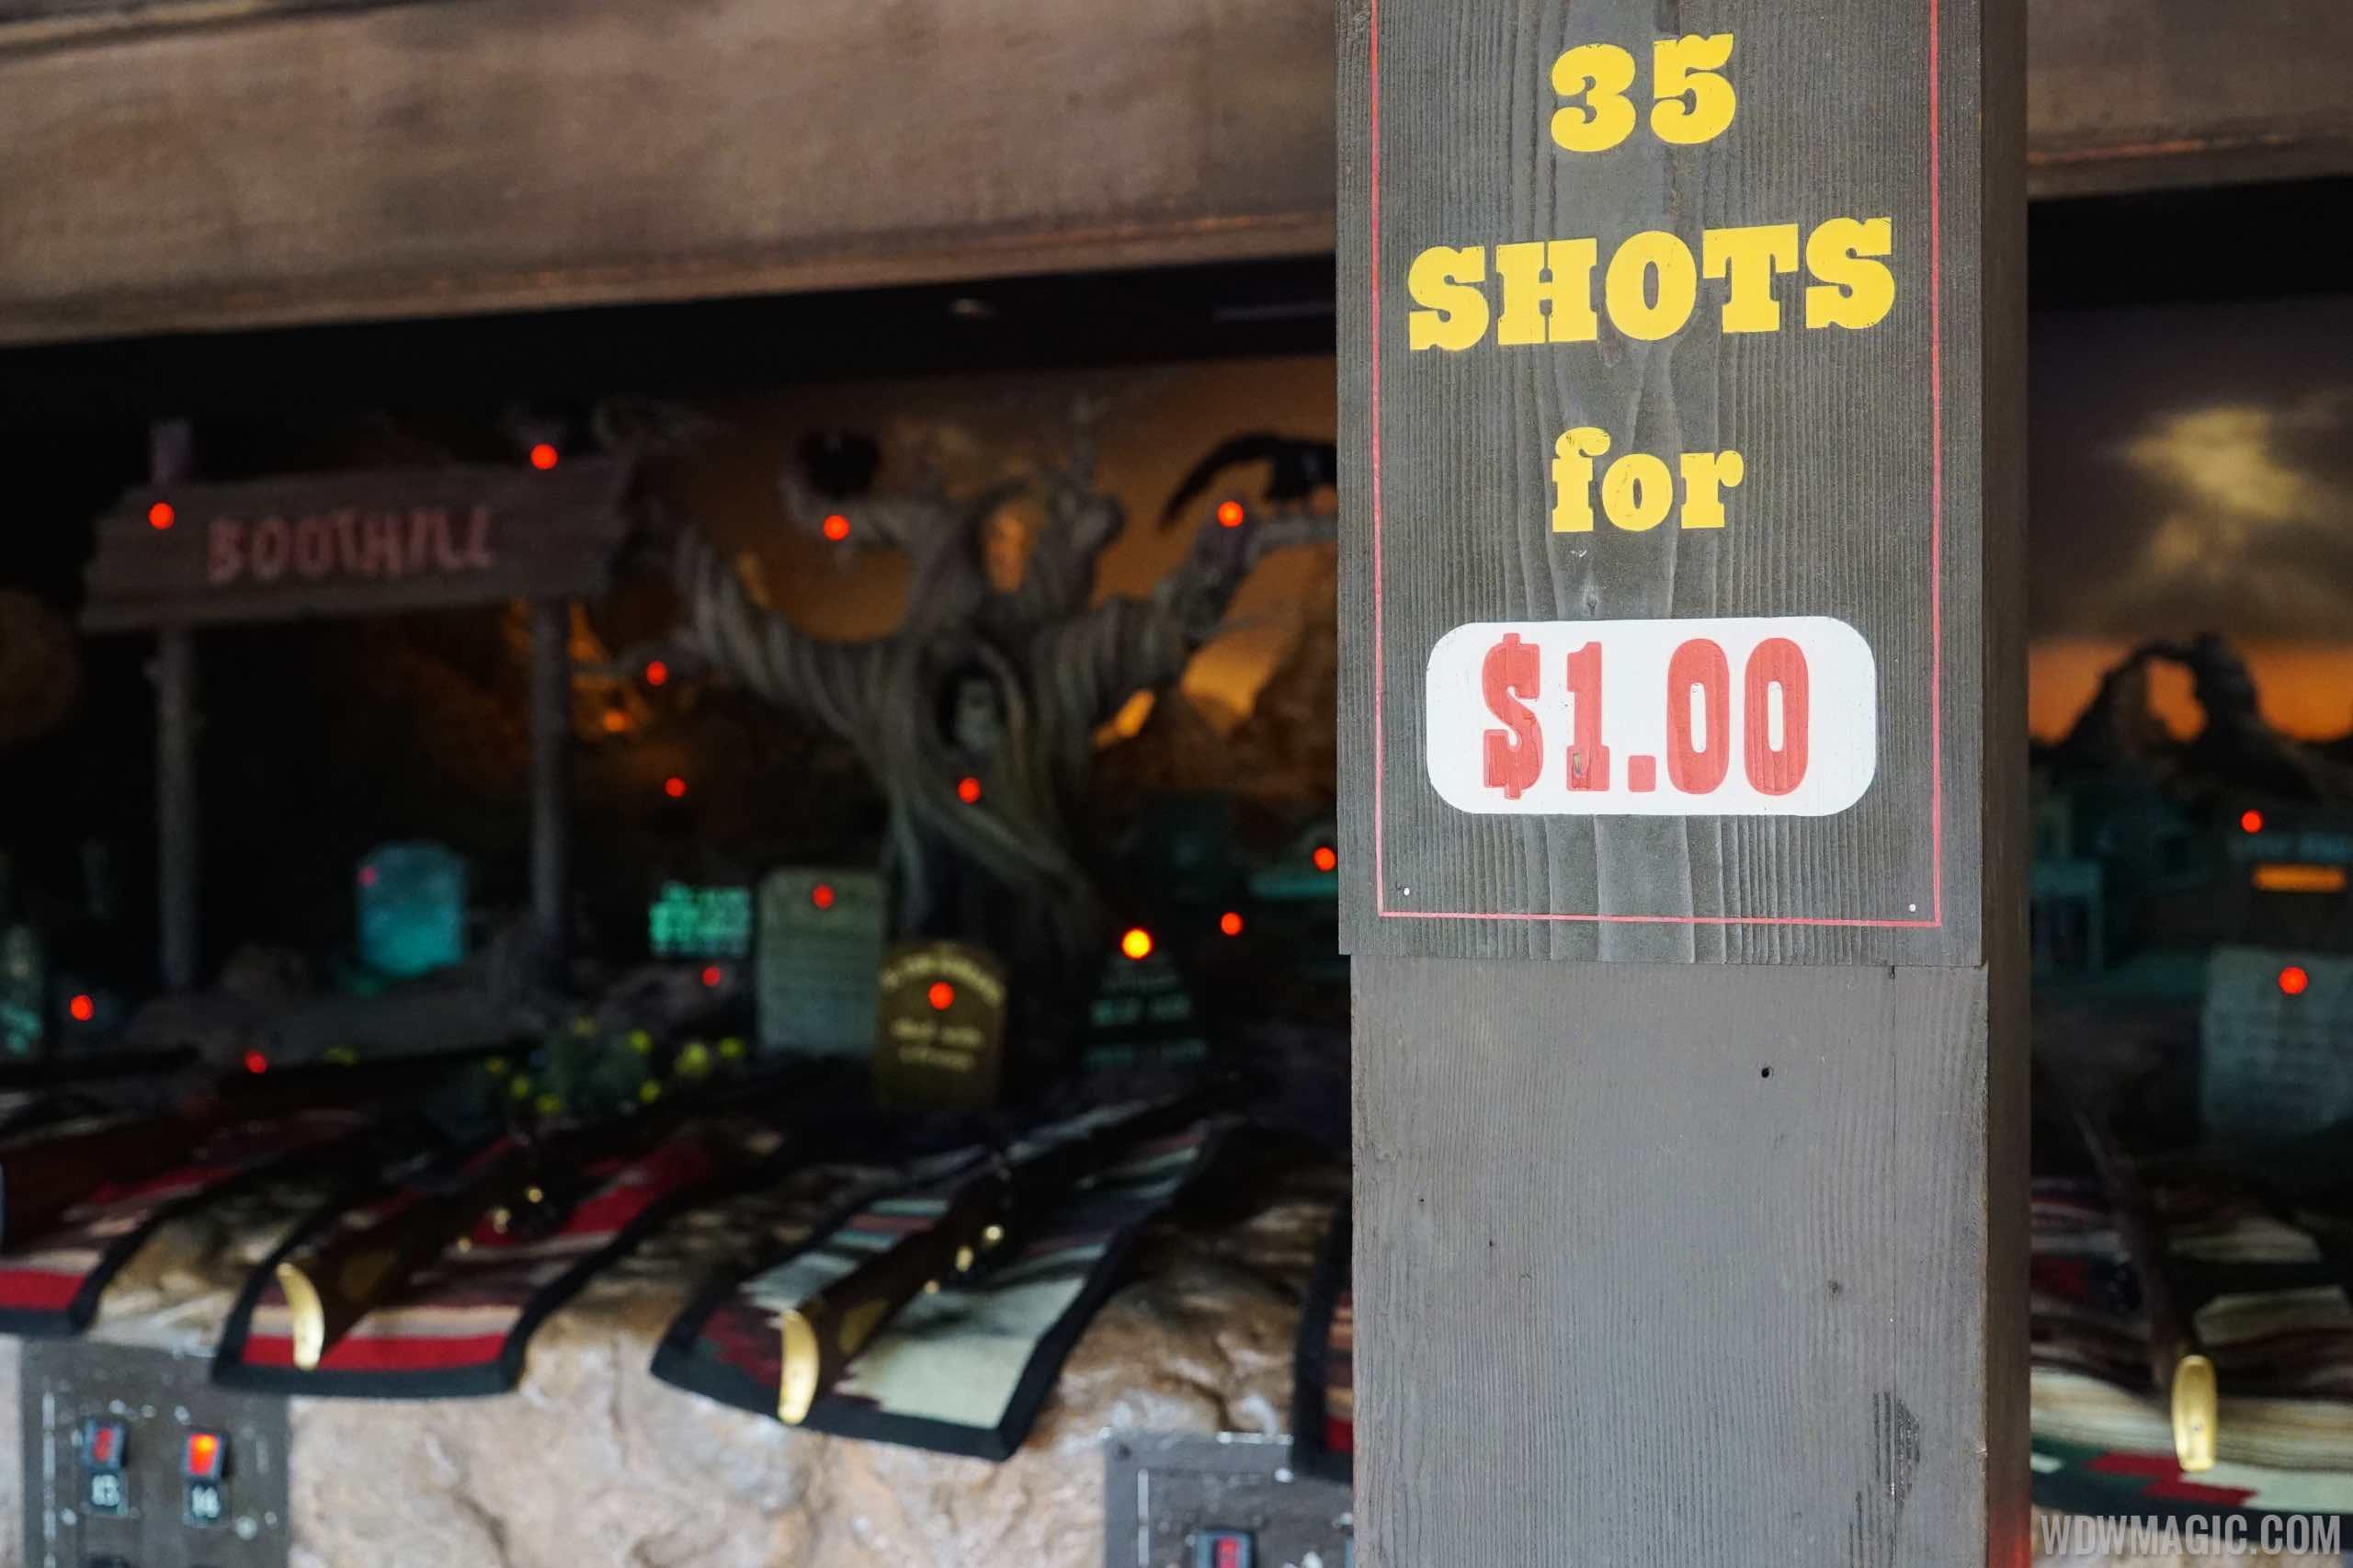 Frontierland Shootin' Arcade overview